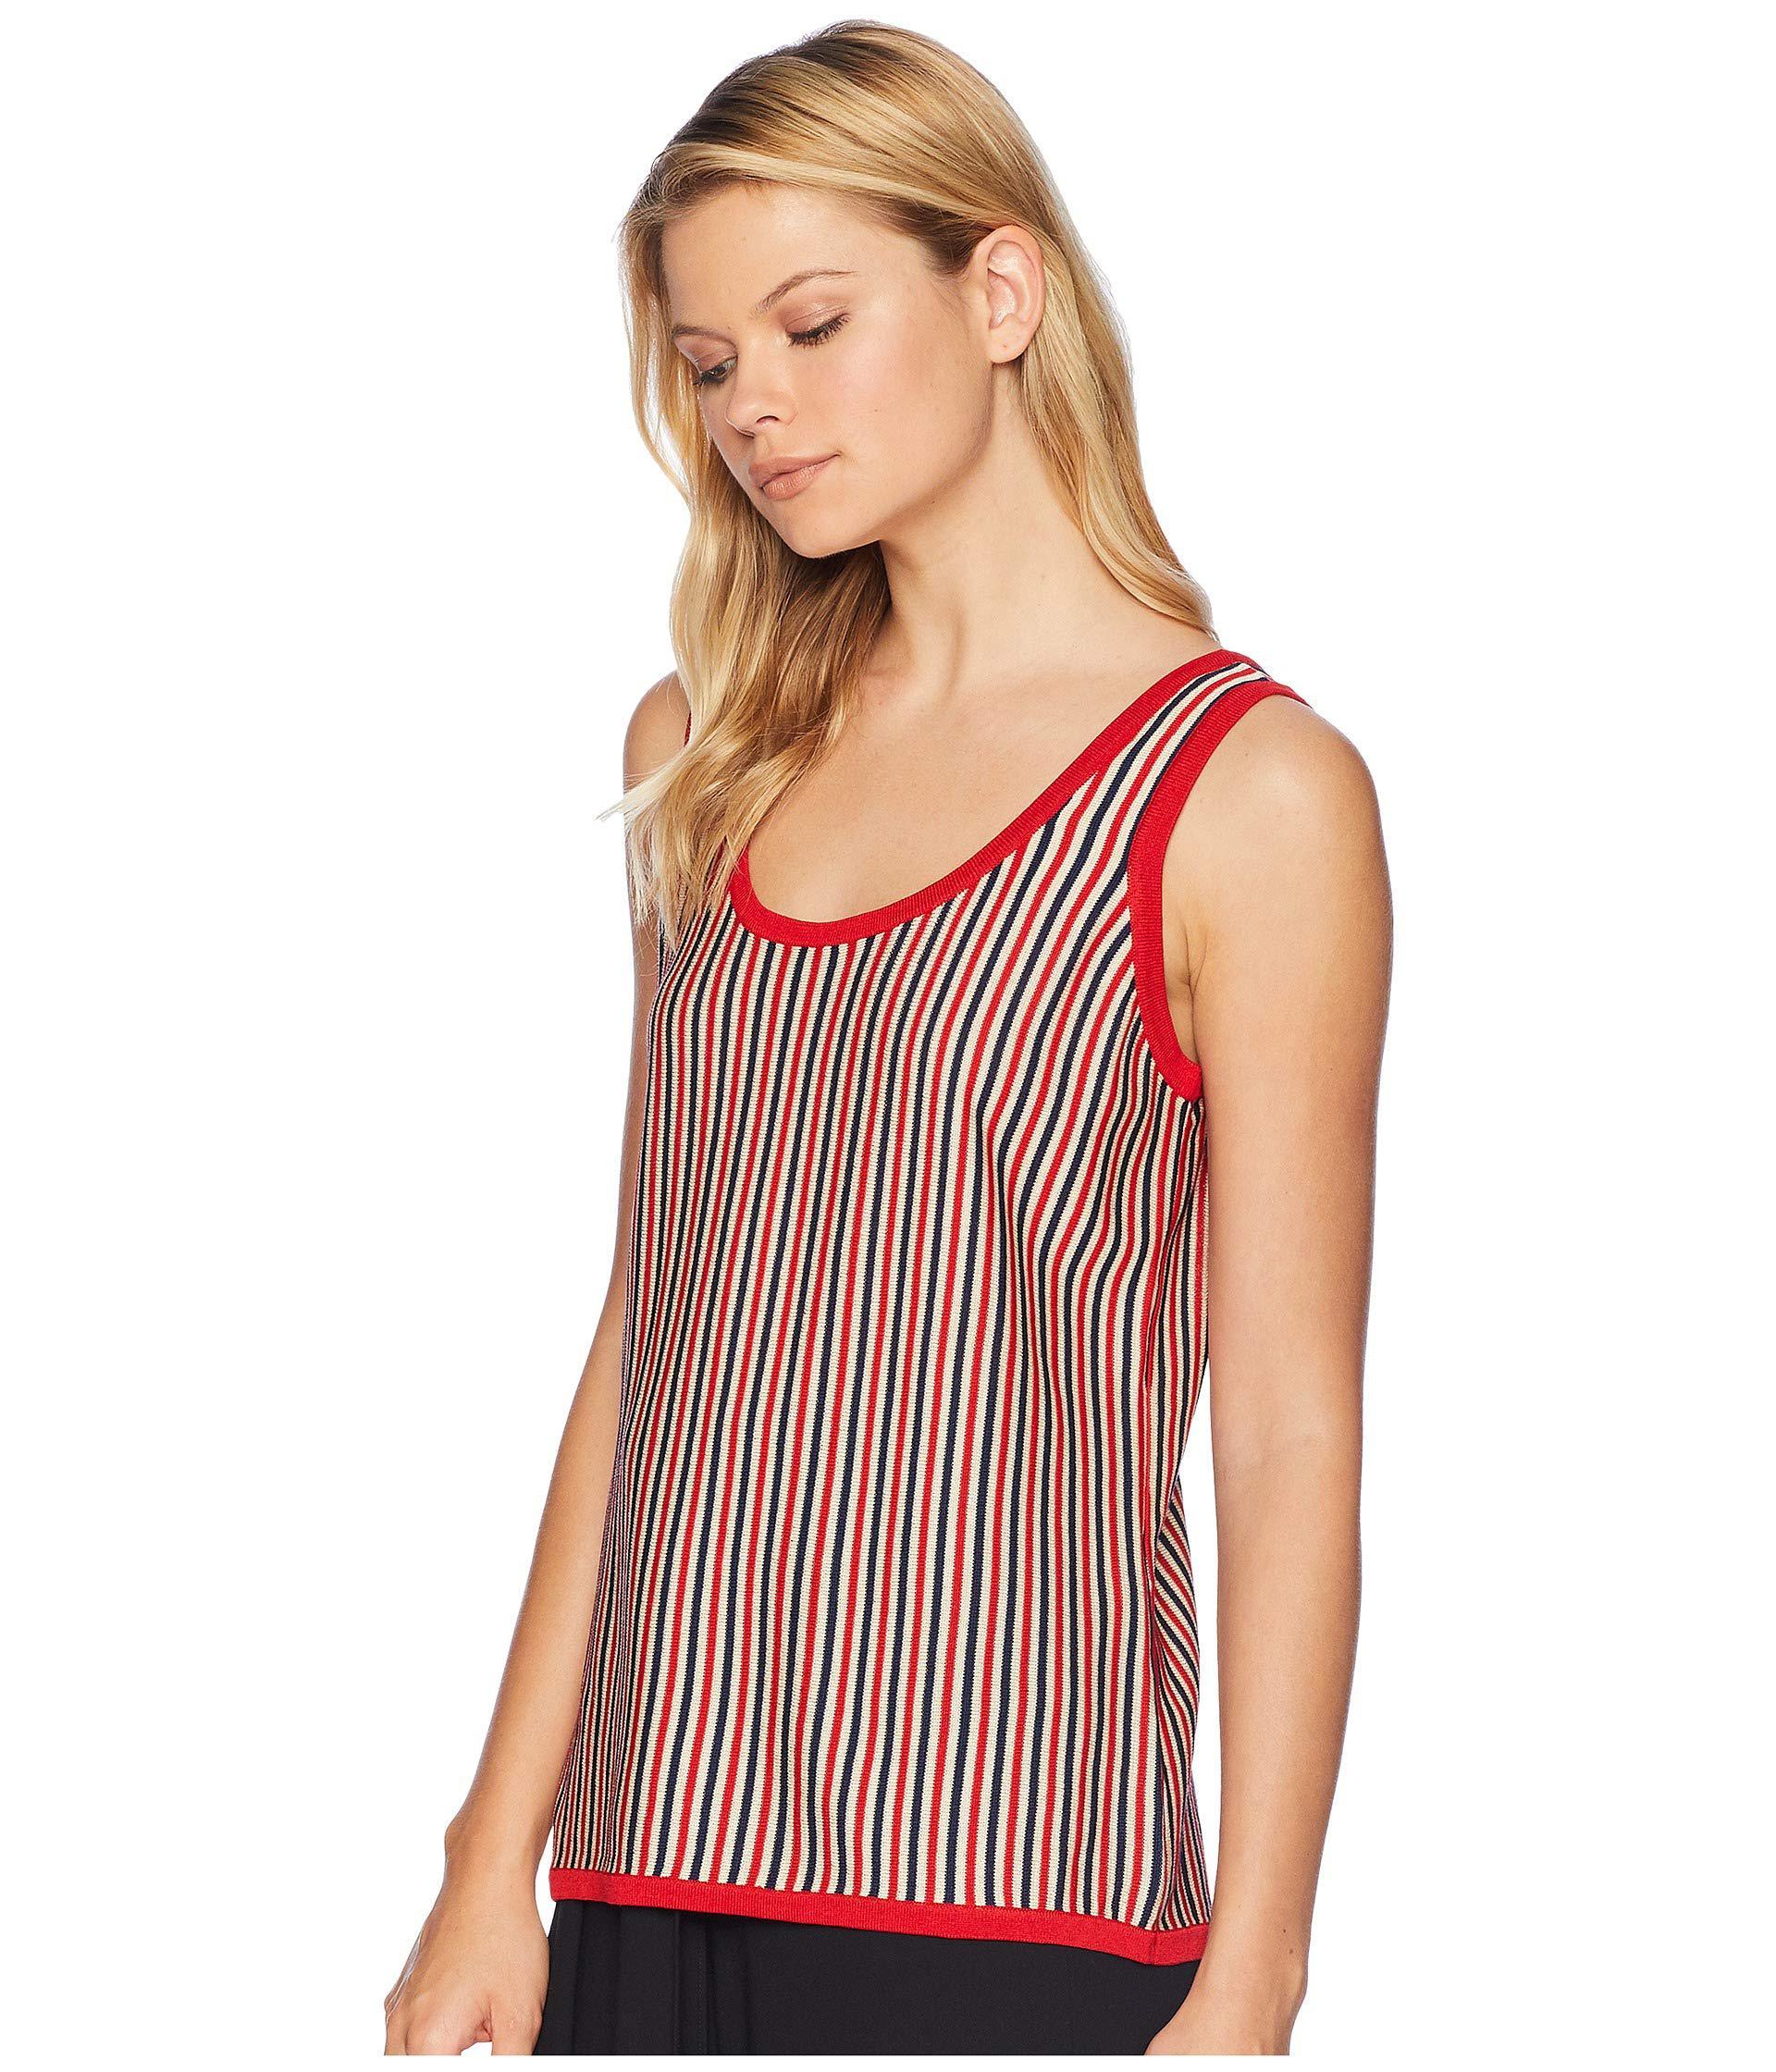 e84264ed6cd3e Lyst - Anne Klein Skinny Stripe Scoop Neck Tank Top in Red - Save 49%